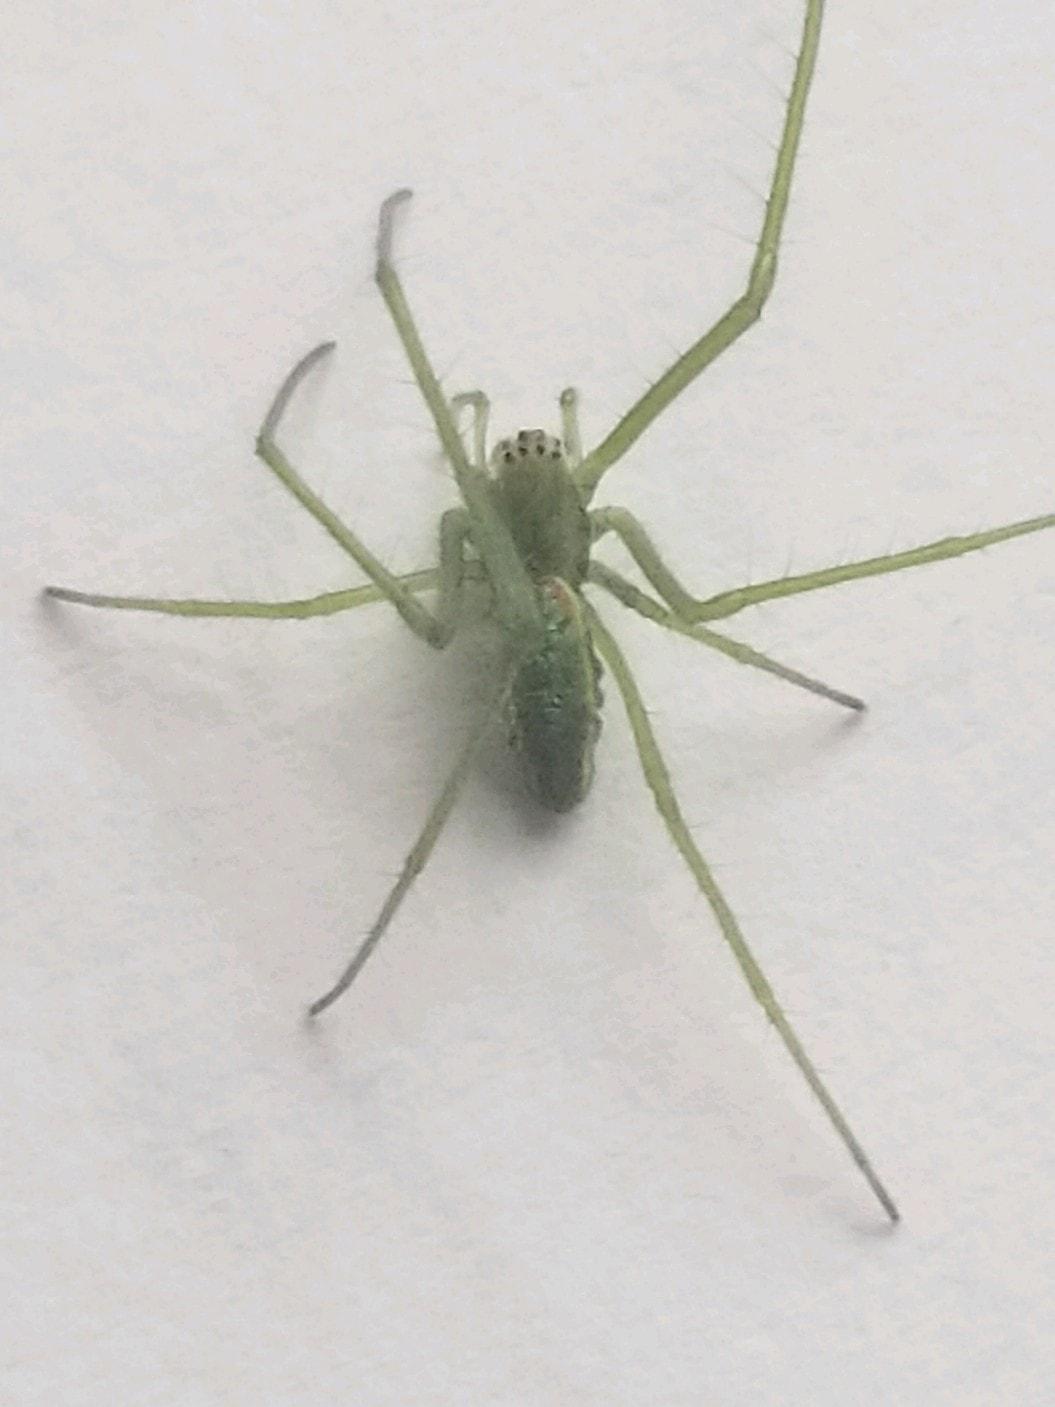 Picture of Tetragnatha viridis - Dorsal